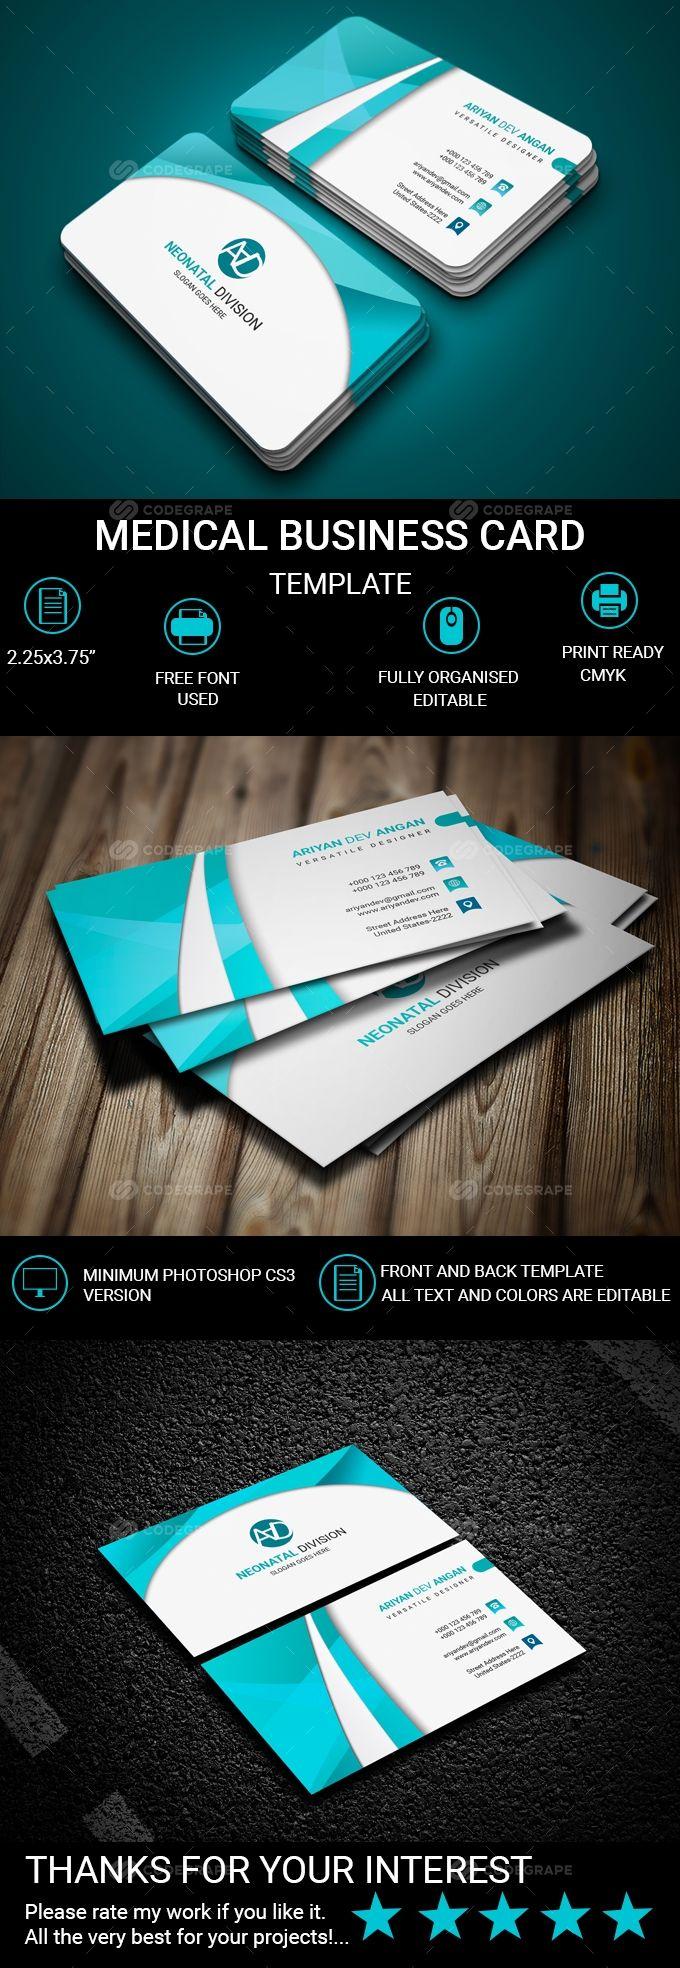 Medical Business Card Medical Business Medical Business Card Double Sided Business Cards